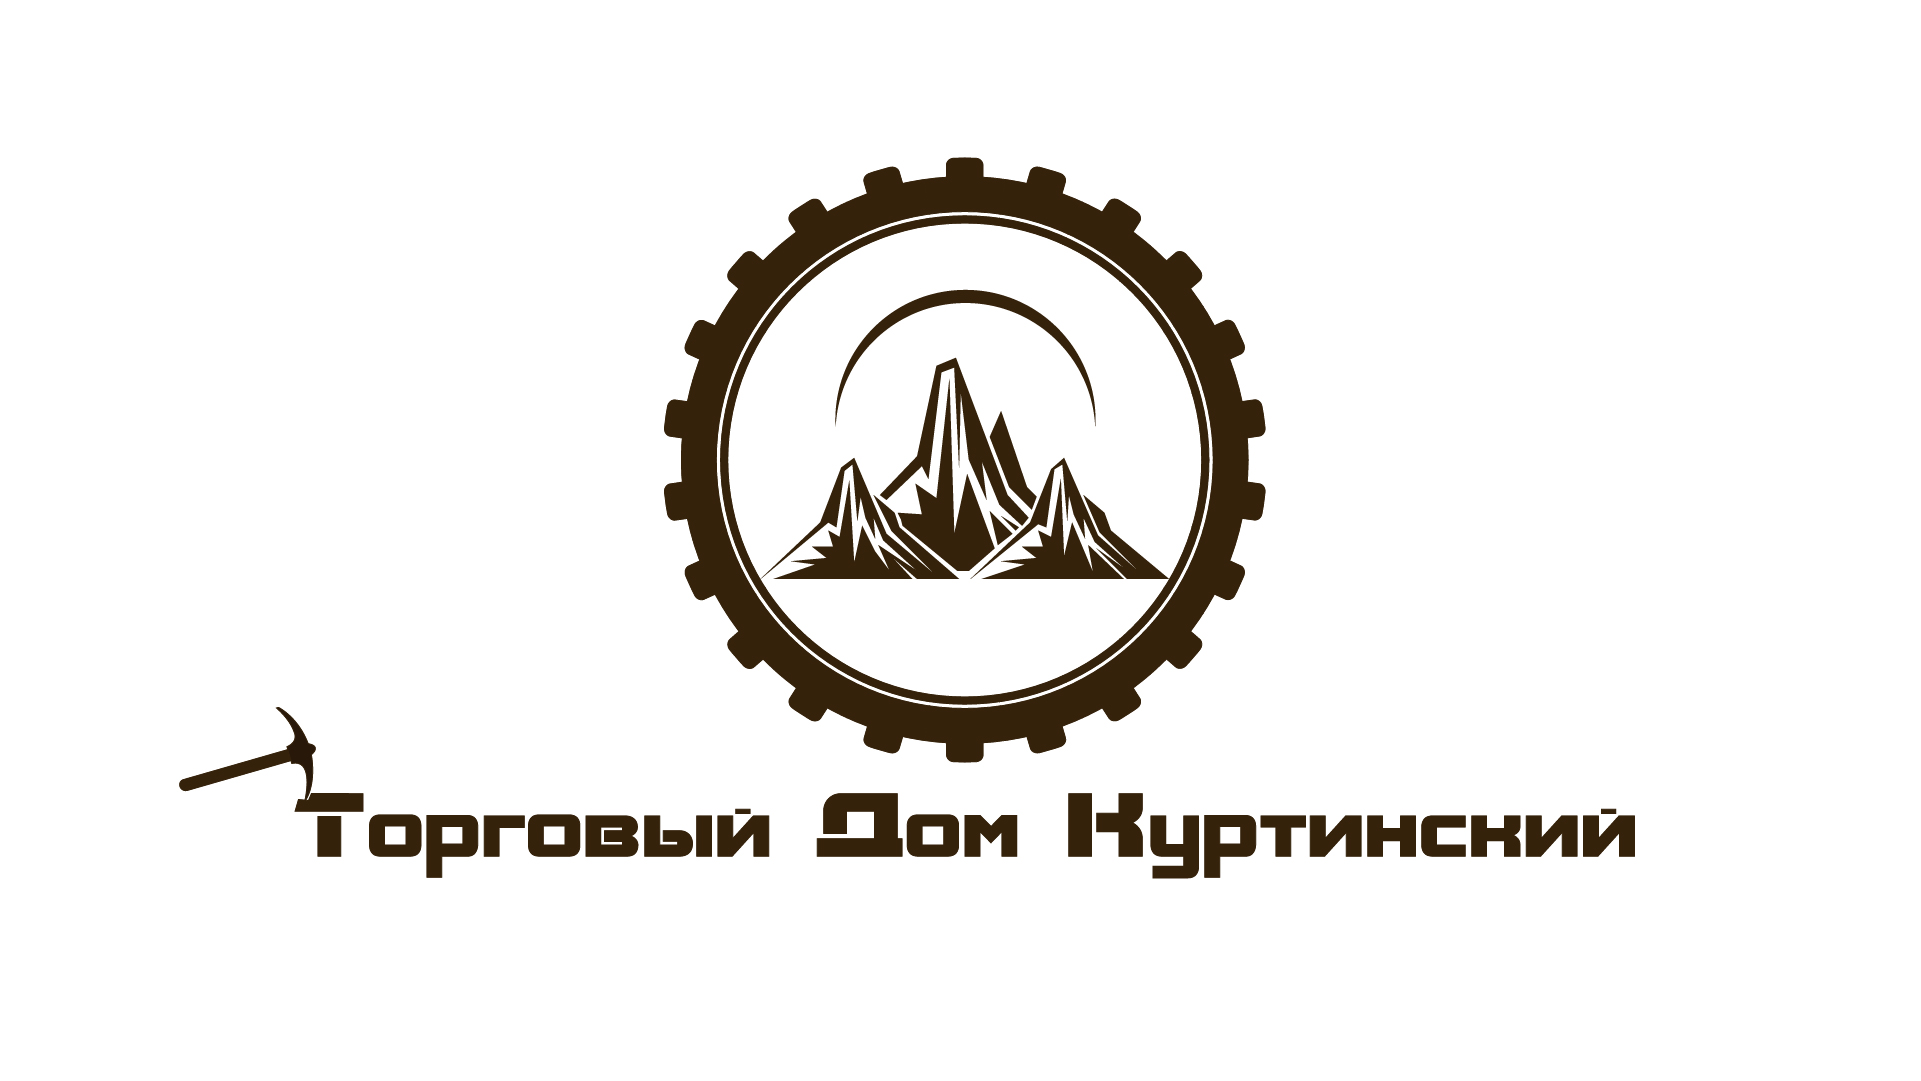 Логотип для камнедобывающей компании фото f_8565b98dca4dfebb.jpg